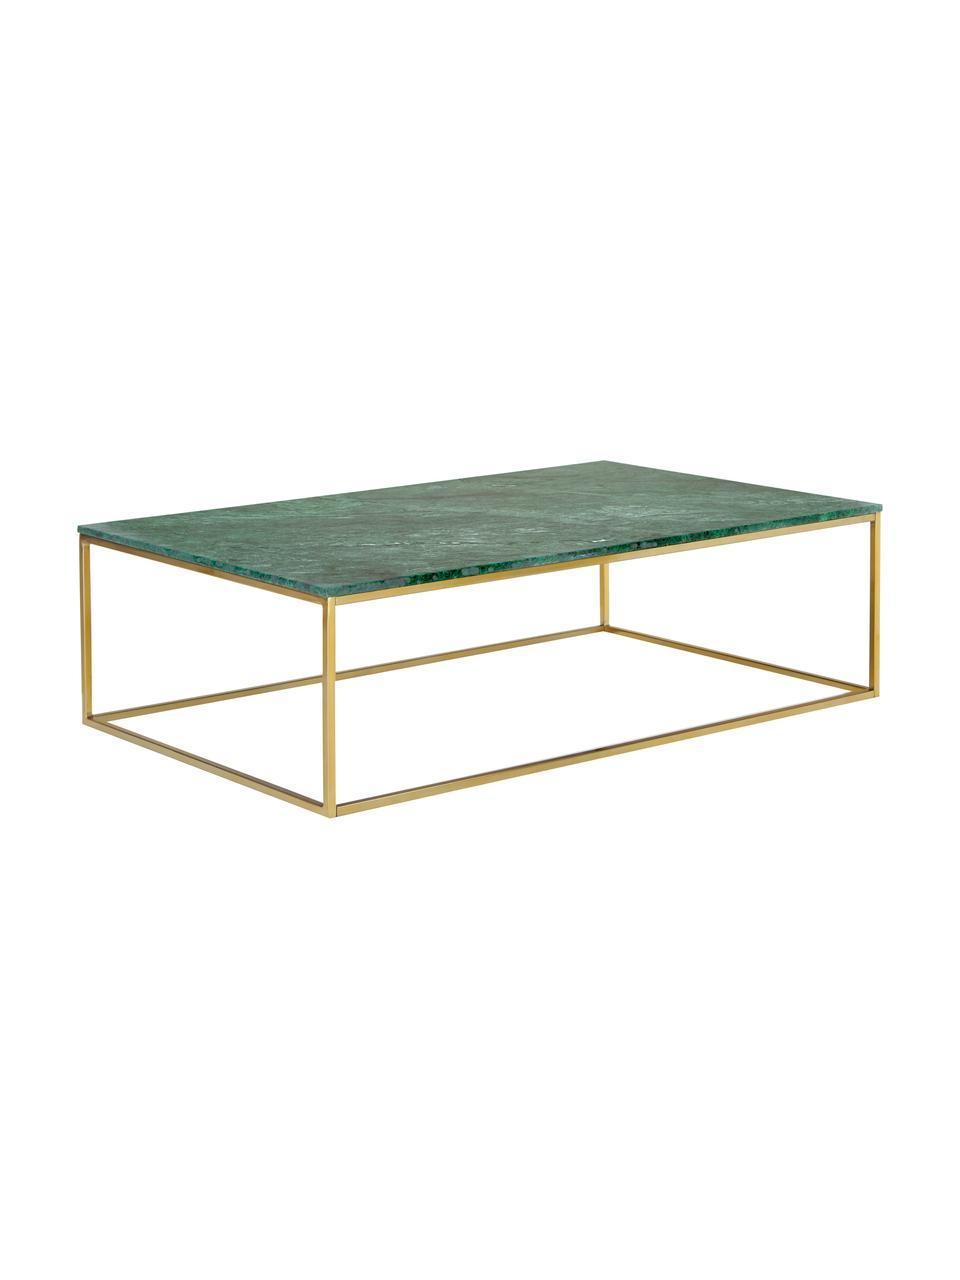 Grote marmeren salontafel Alys, Tafelblad: marmer, Frame: gecoat metaal, Groen marmer, goudkleurig, 120 x 35 cm